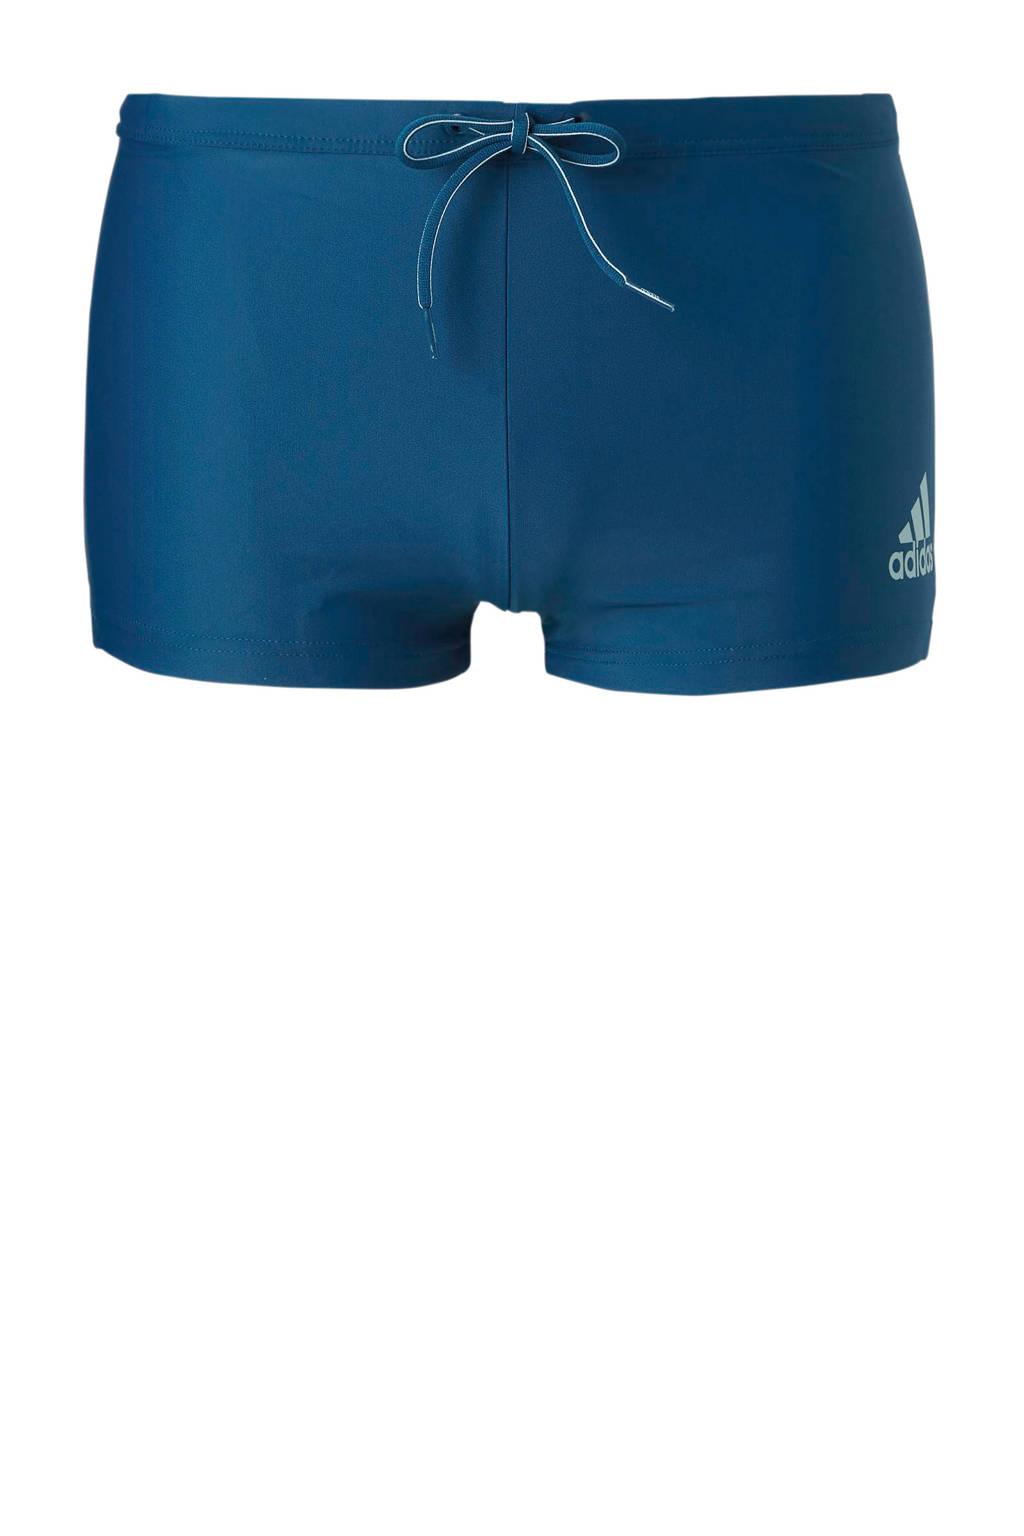 adidas performance zwemboxer met logo blauw, Blauw